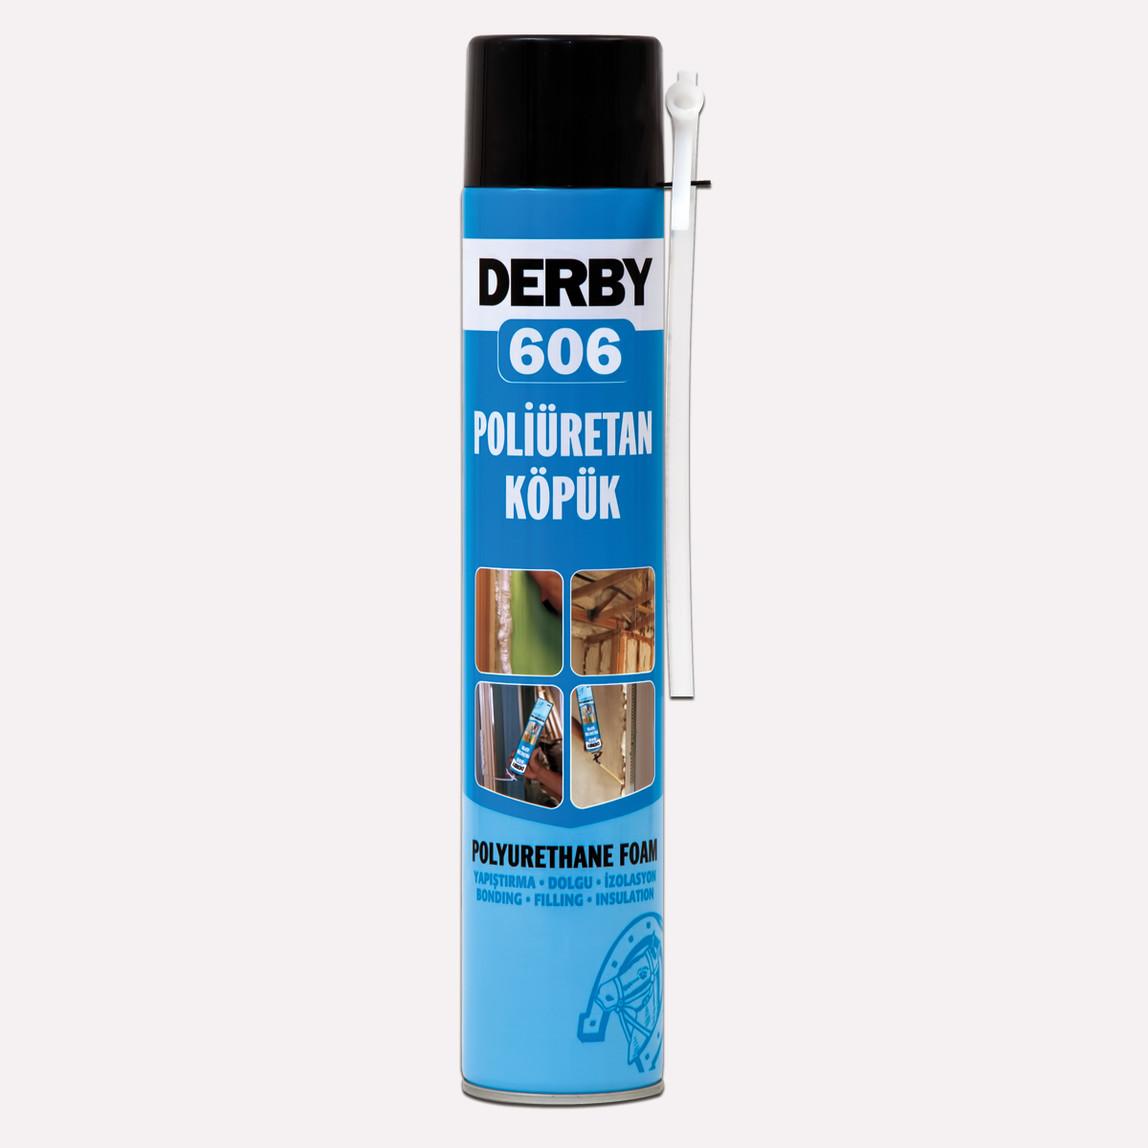 Derby 606 Poliüretan Köpük Sprey